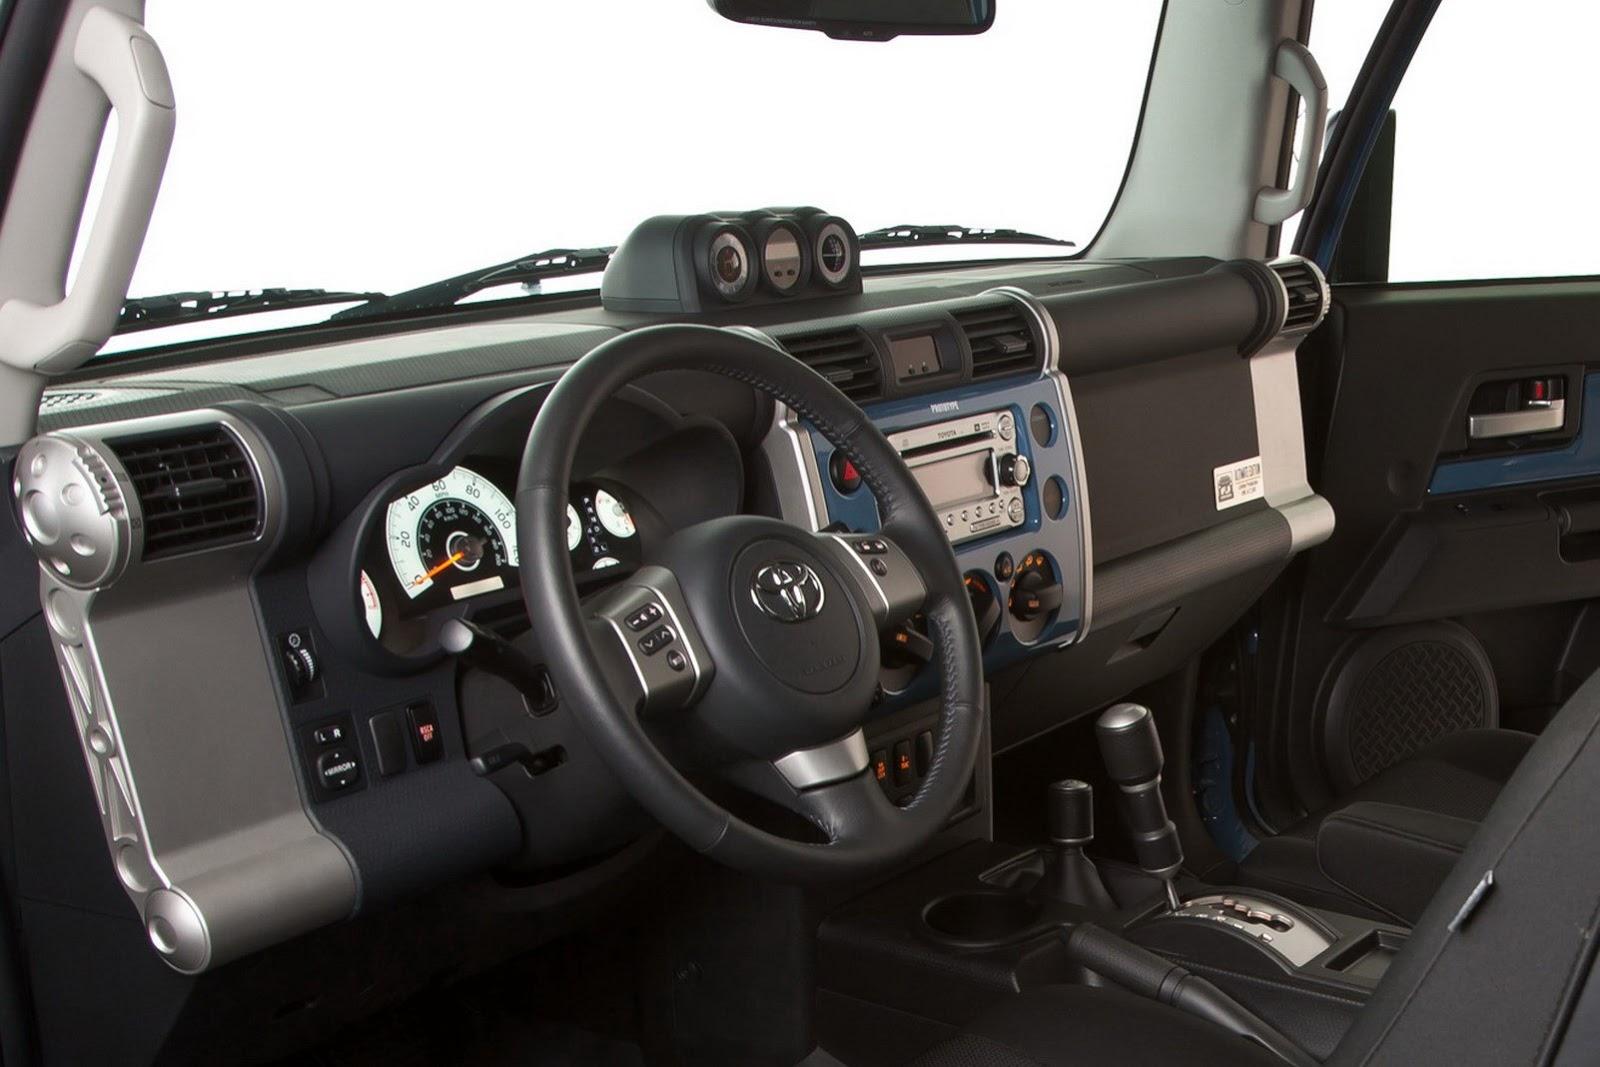 2014 toyota fj cruiser interior. see all photos 2014 toyota fj cruiser interior